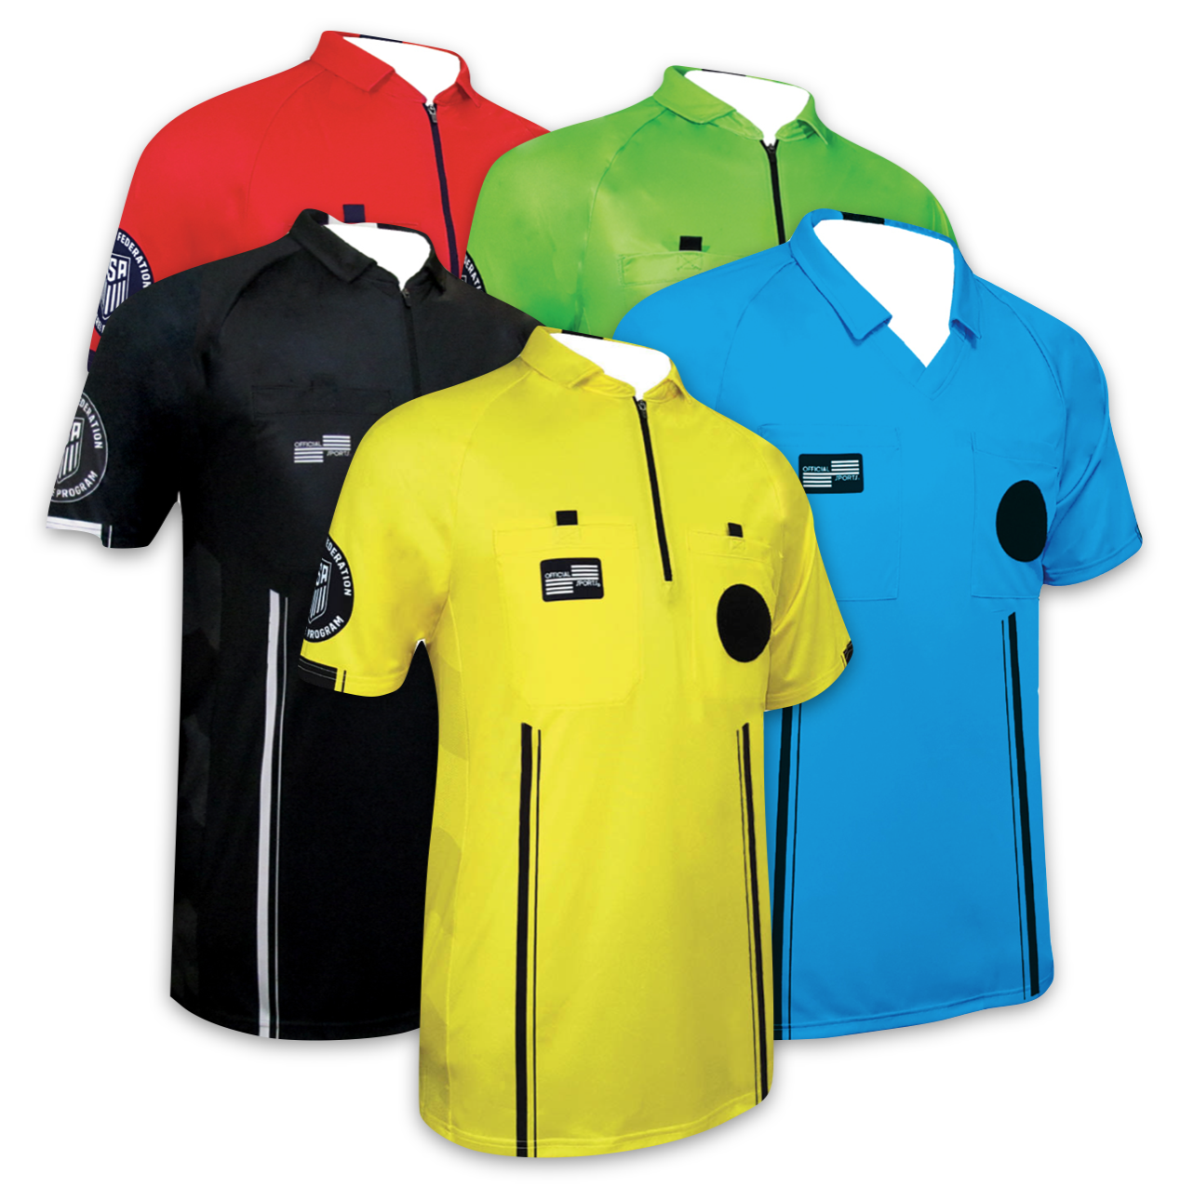 USSF North Carolina - Referee Information - Referee Uniforms